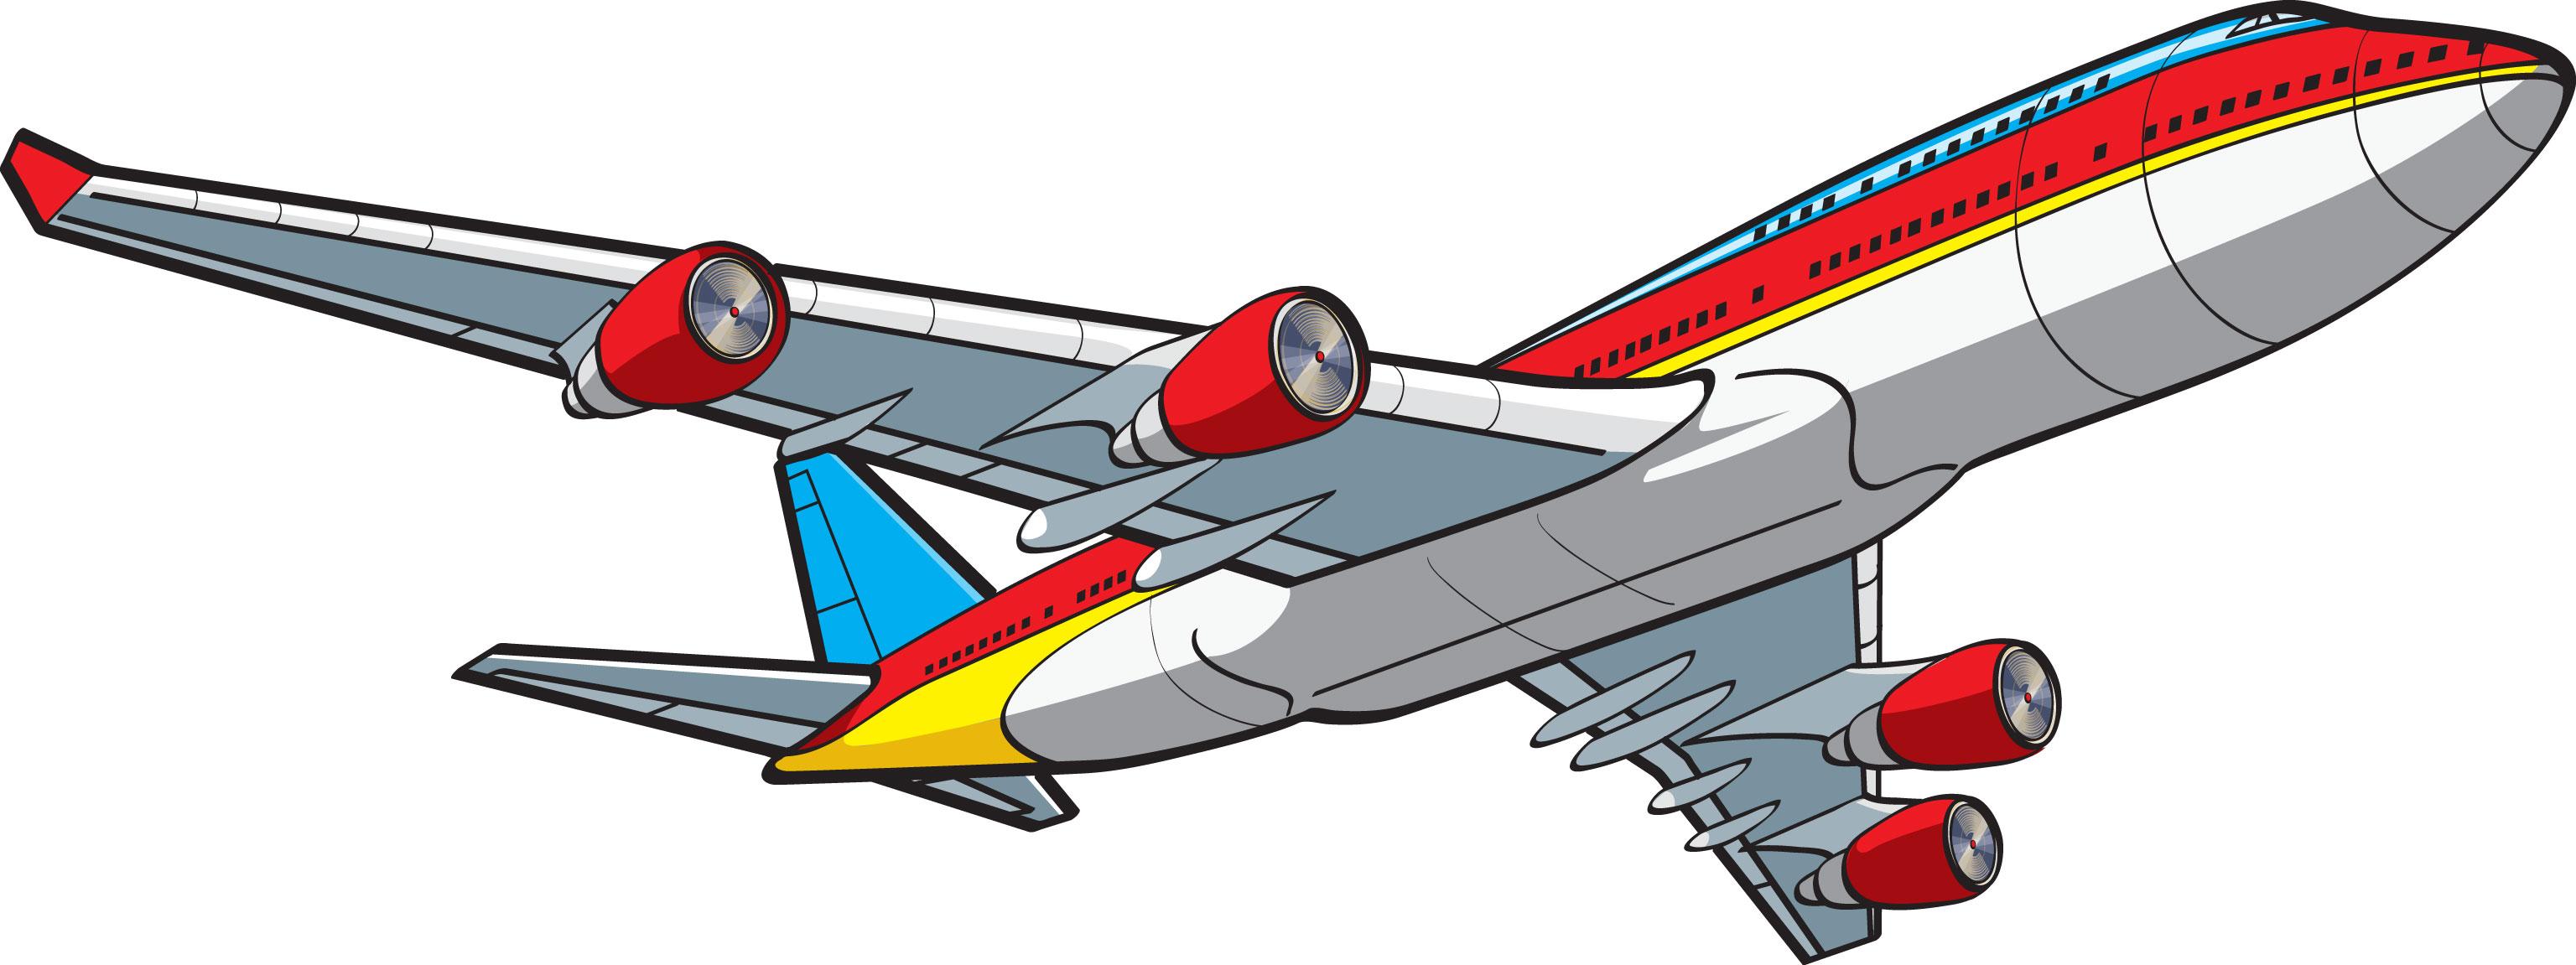 3072x1151 Clip Art Fighter Jet Clip Art